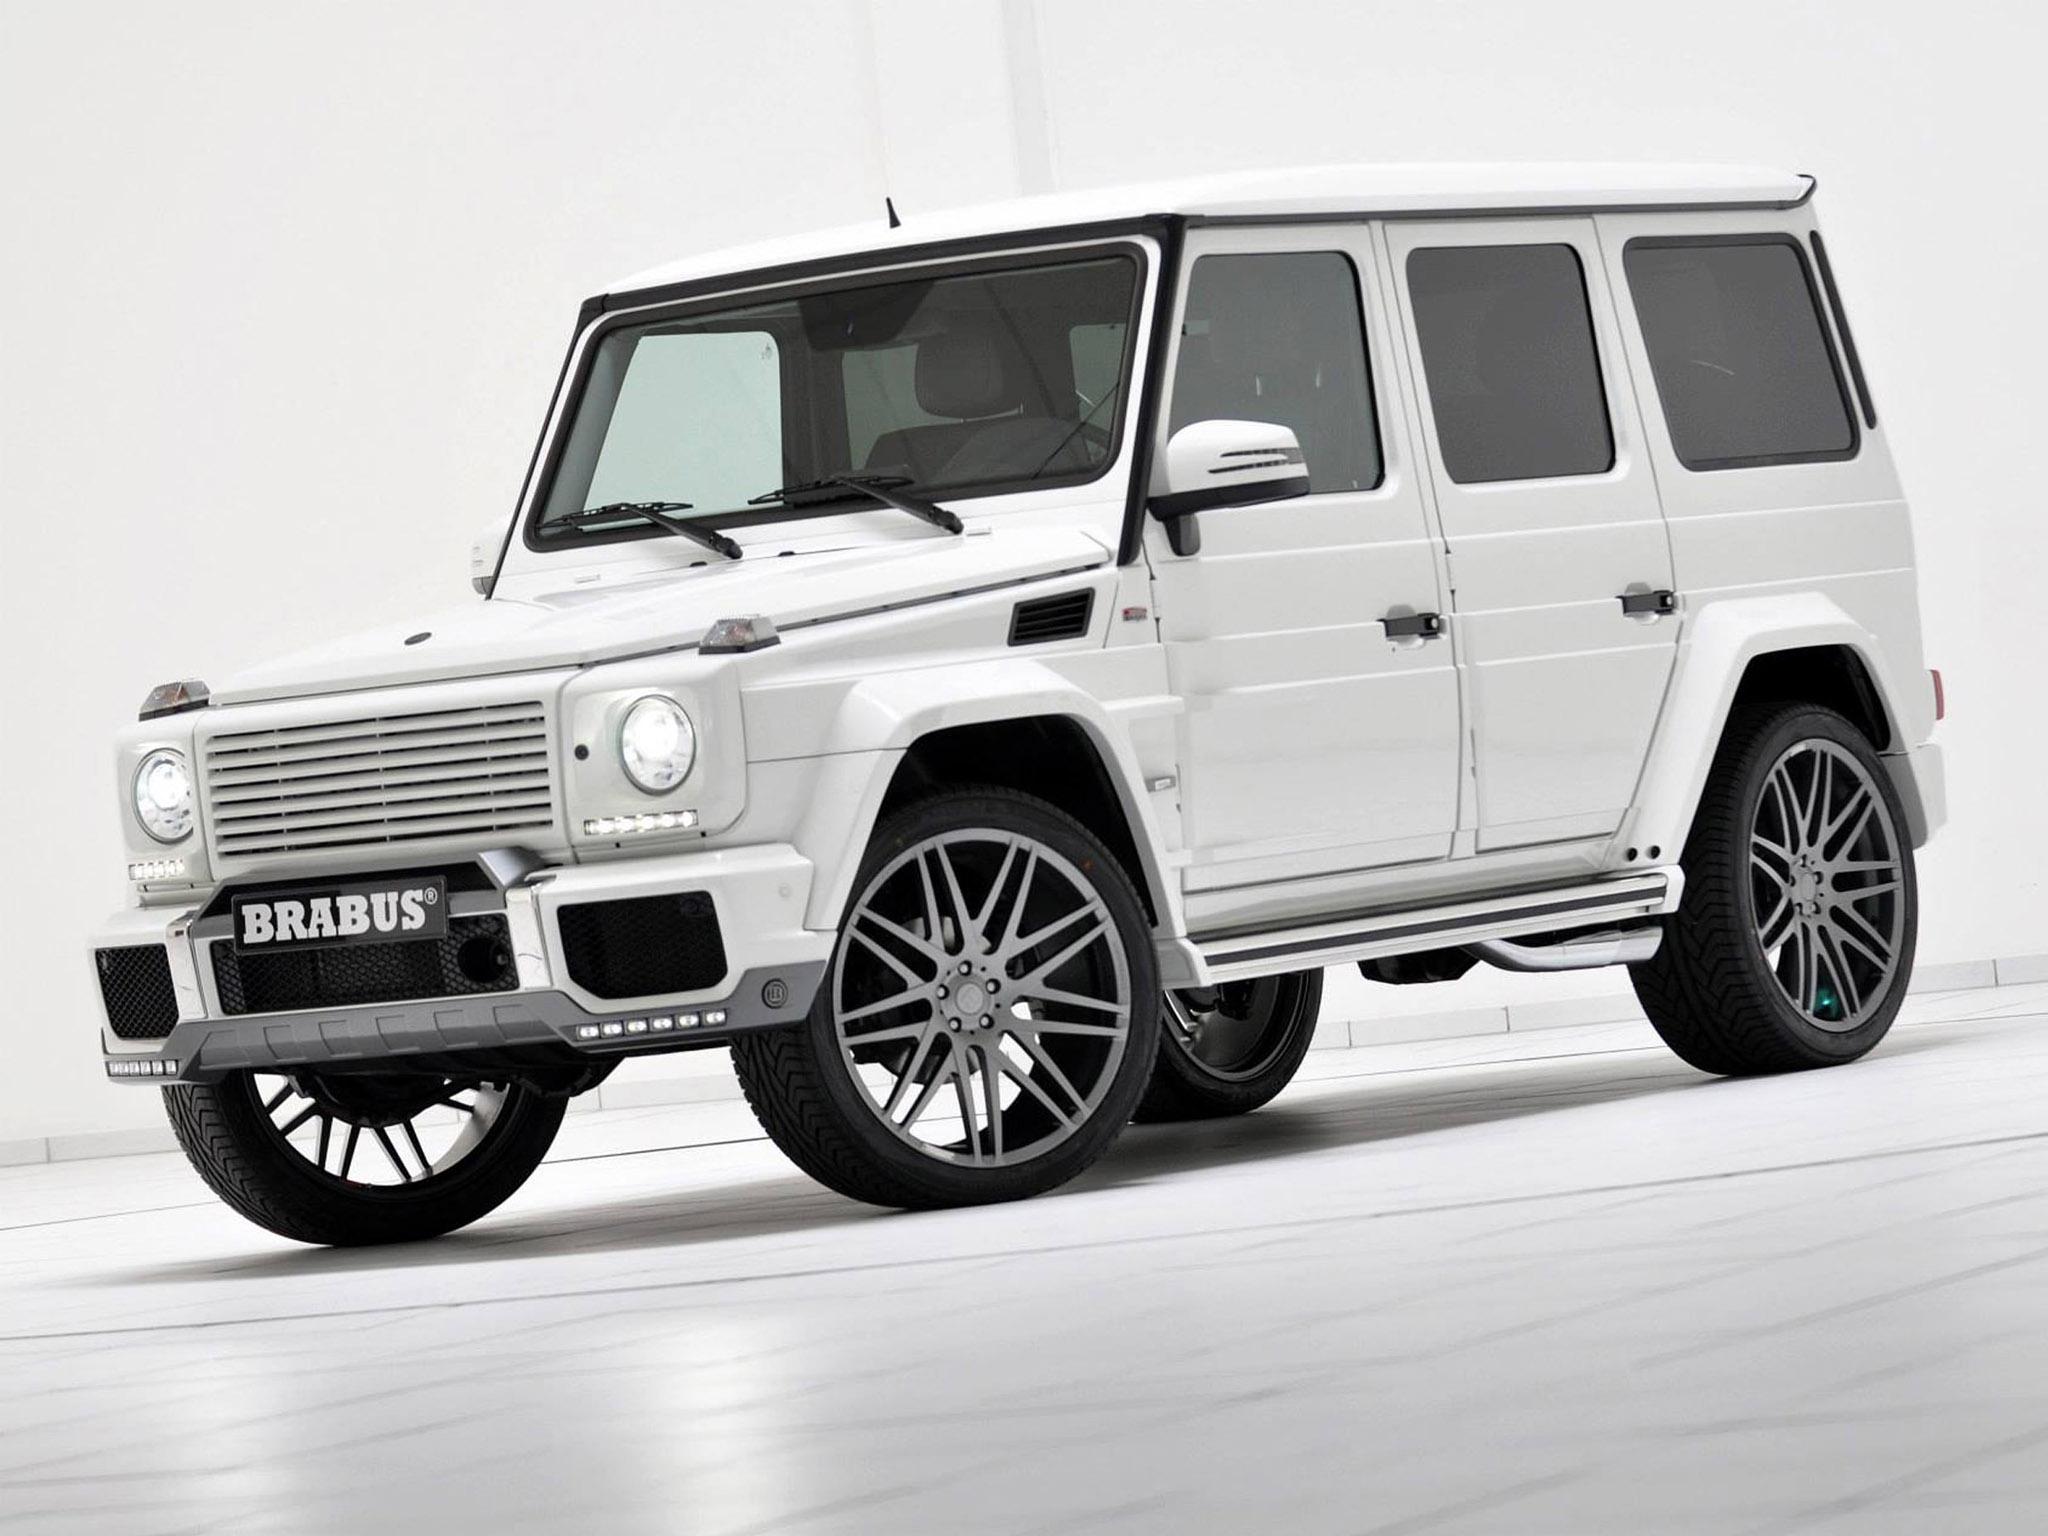 2013 brabus widestar mercedes benz g class 350 cdi suv tuning f wallpaper 2048x1536 123629 wallpaperup - White Mercedes Suv 2013